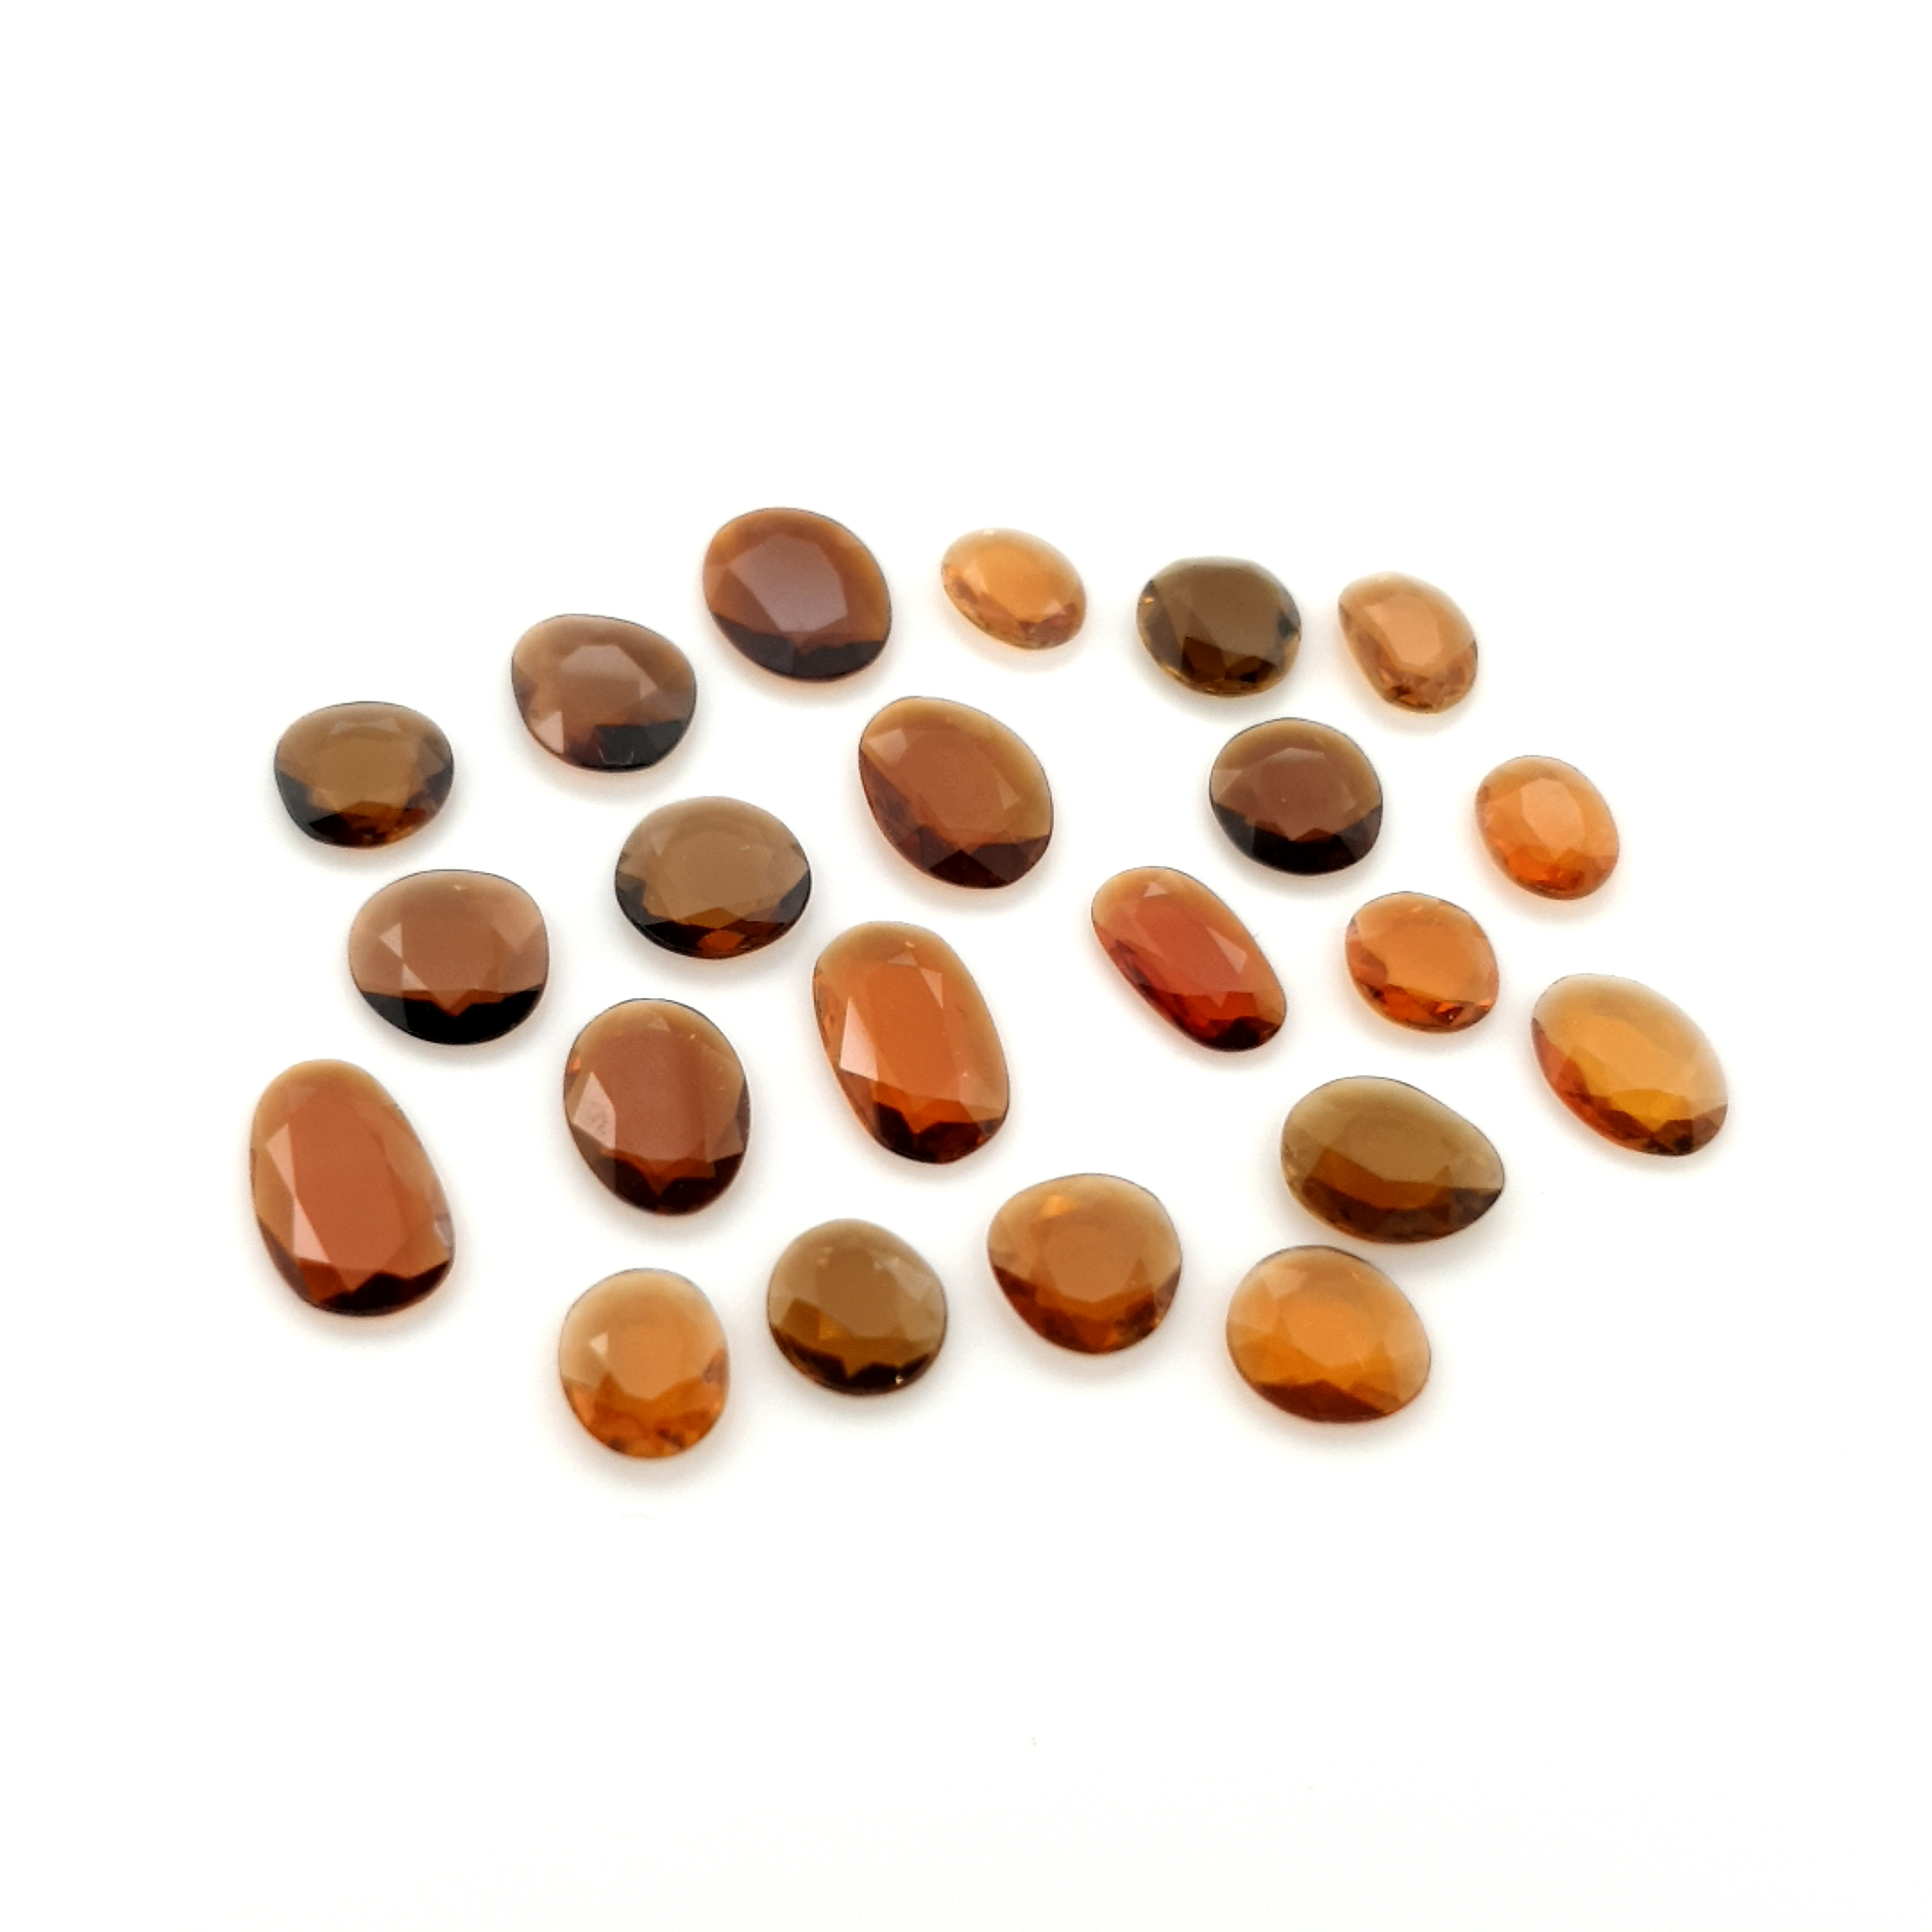 0,50-0,75ct.size Brown Tourmalin DoubleRoseCut TMK09C2 ClaudiaHamann__2021-02-11-23-52-21